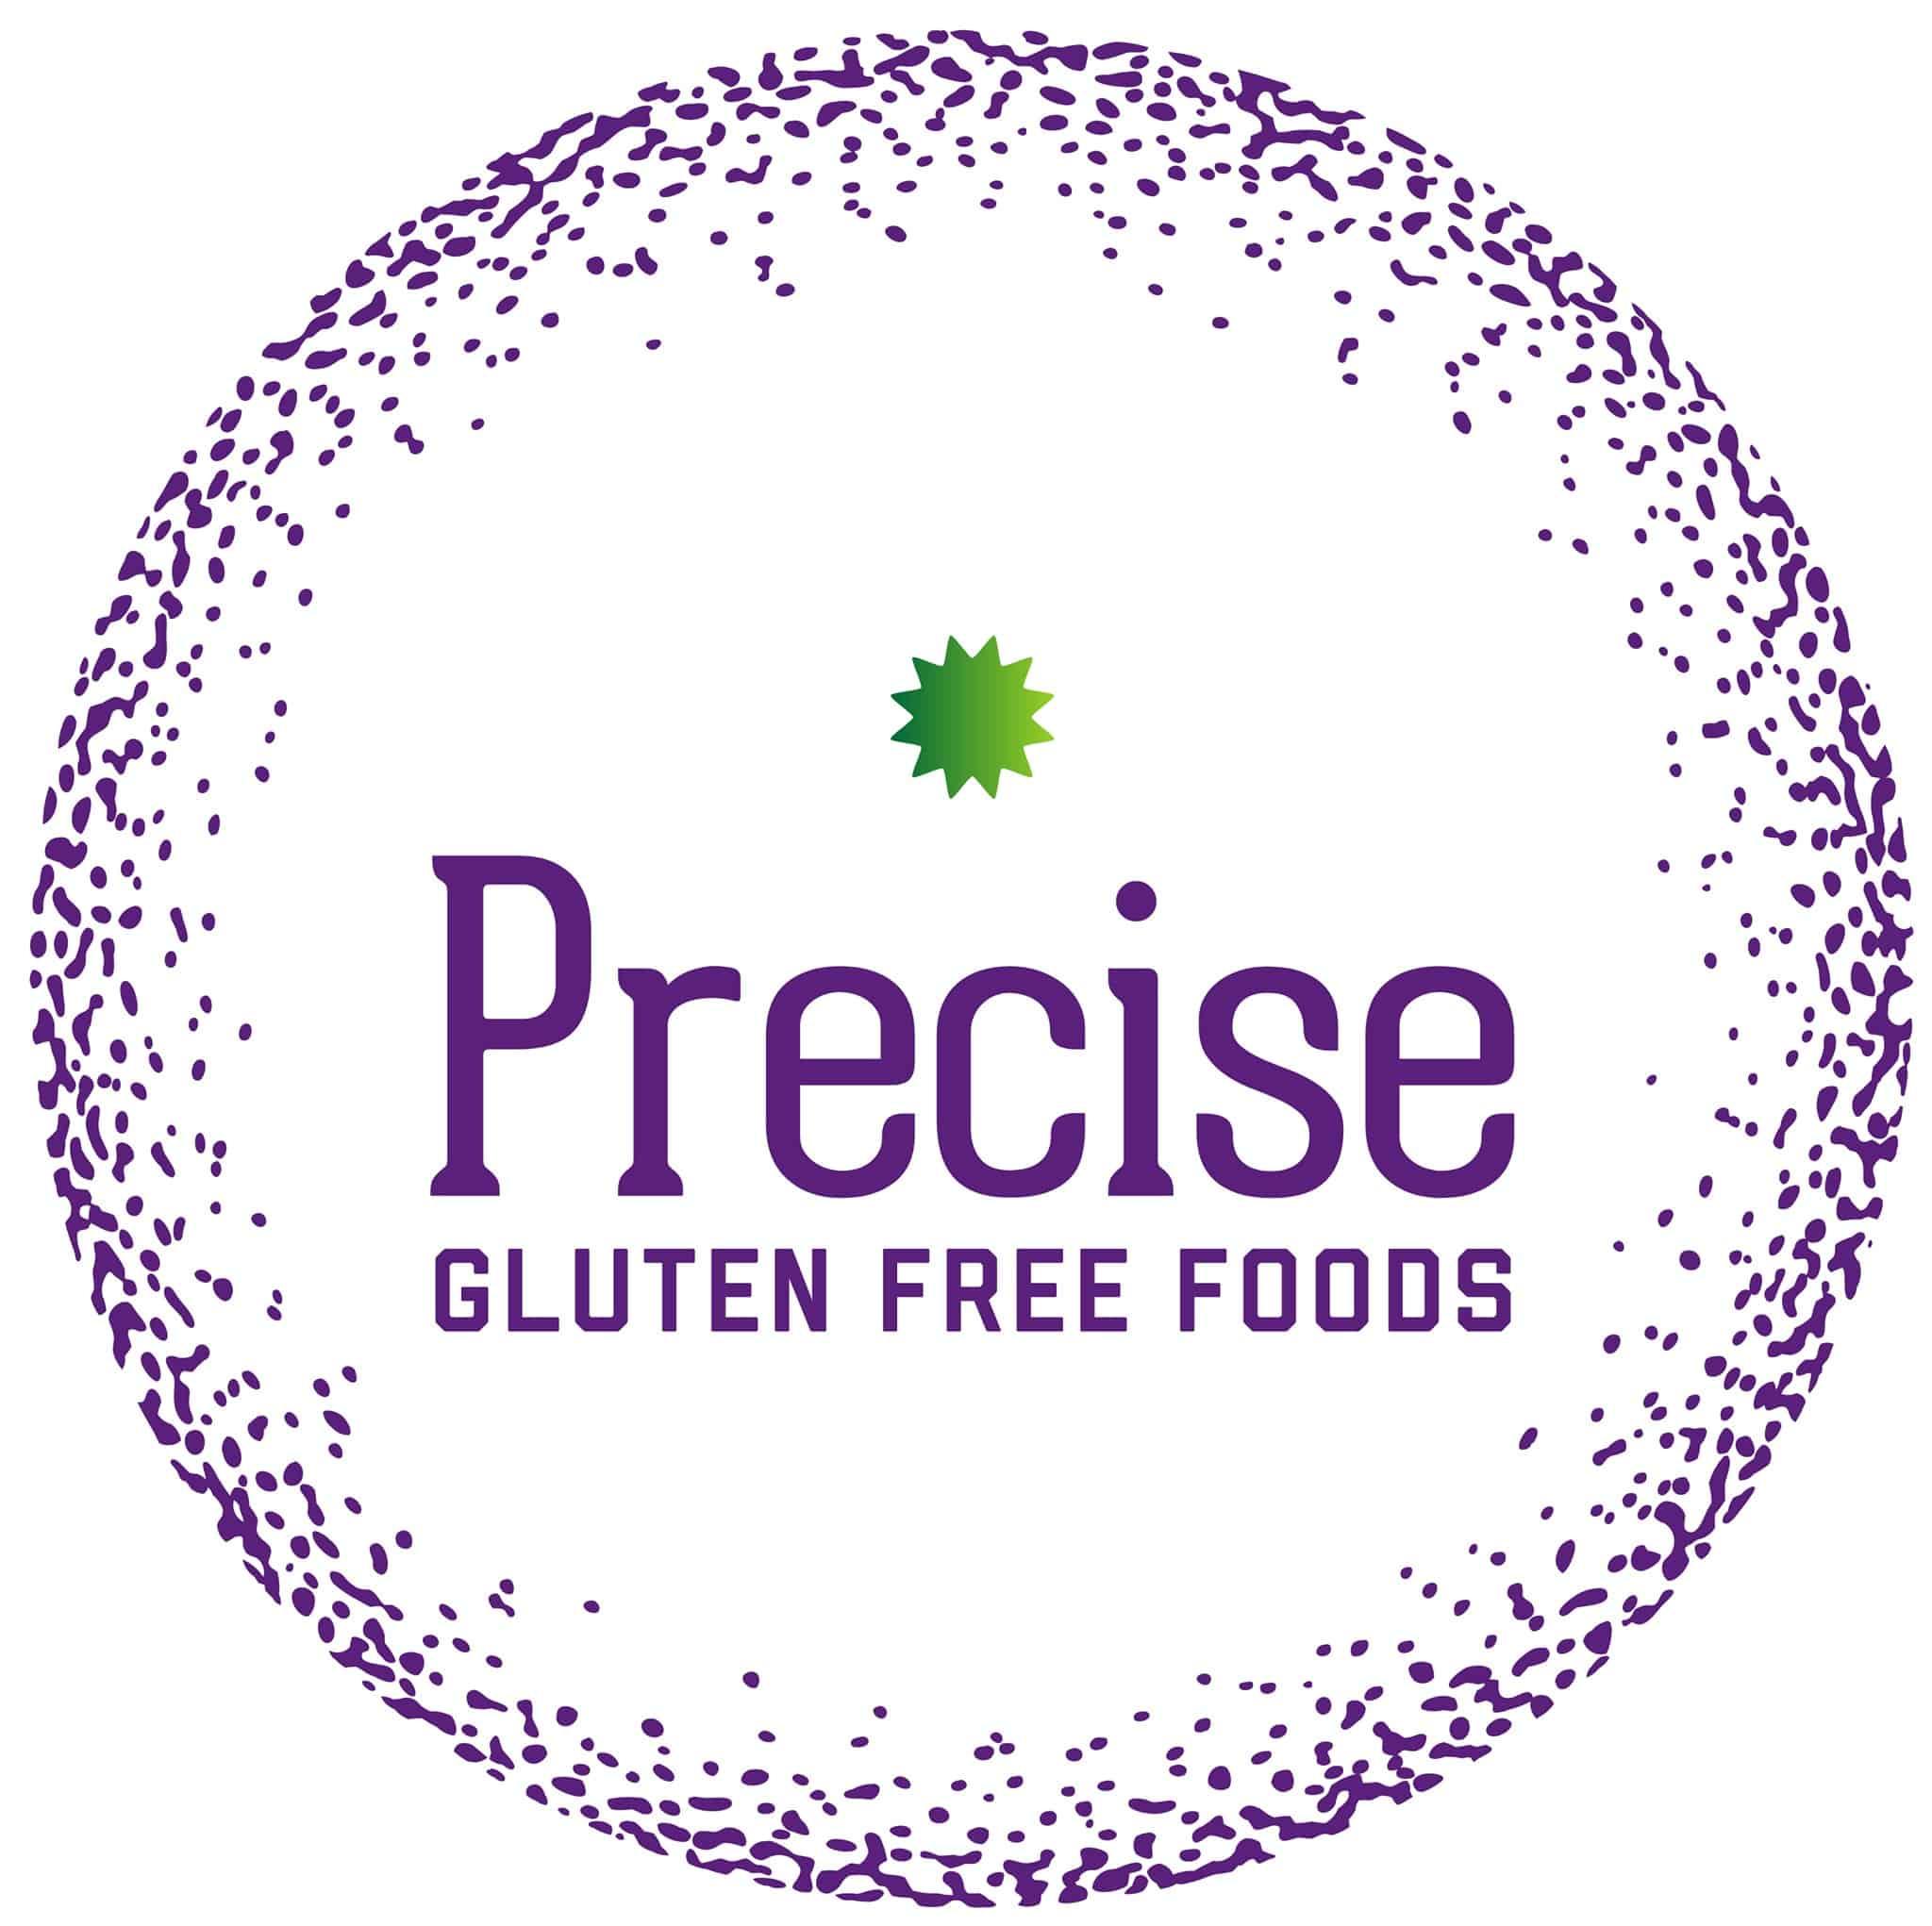 Precise Gluten Free Foods